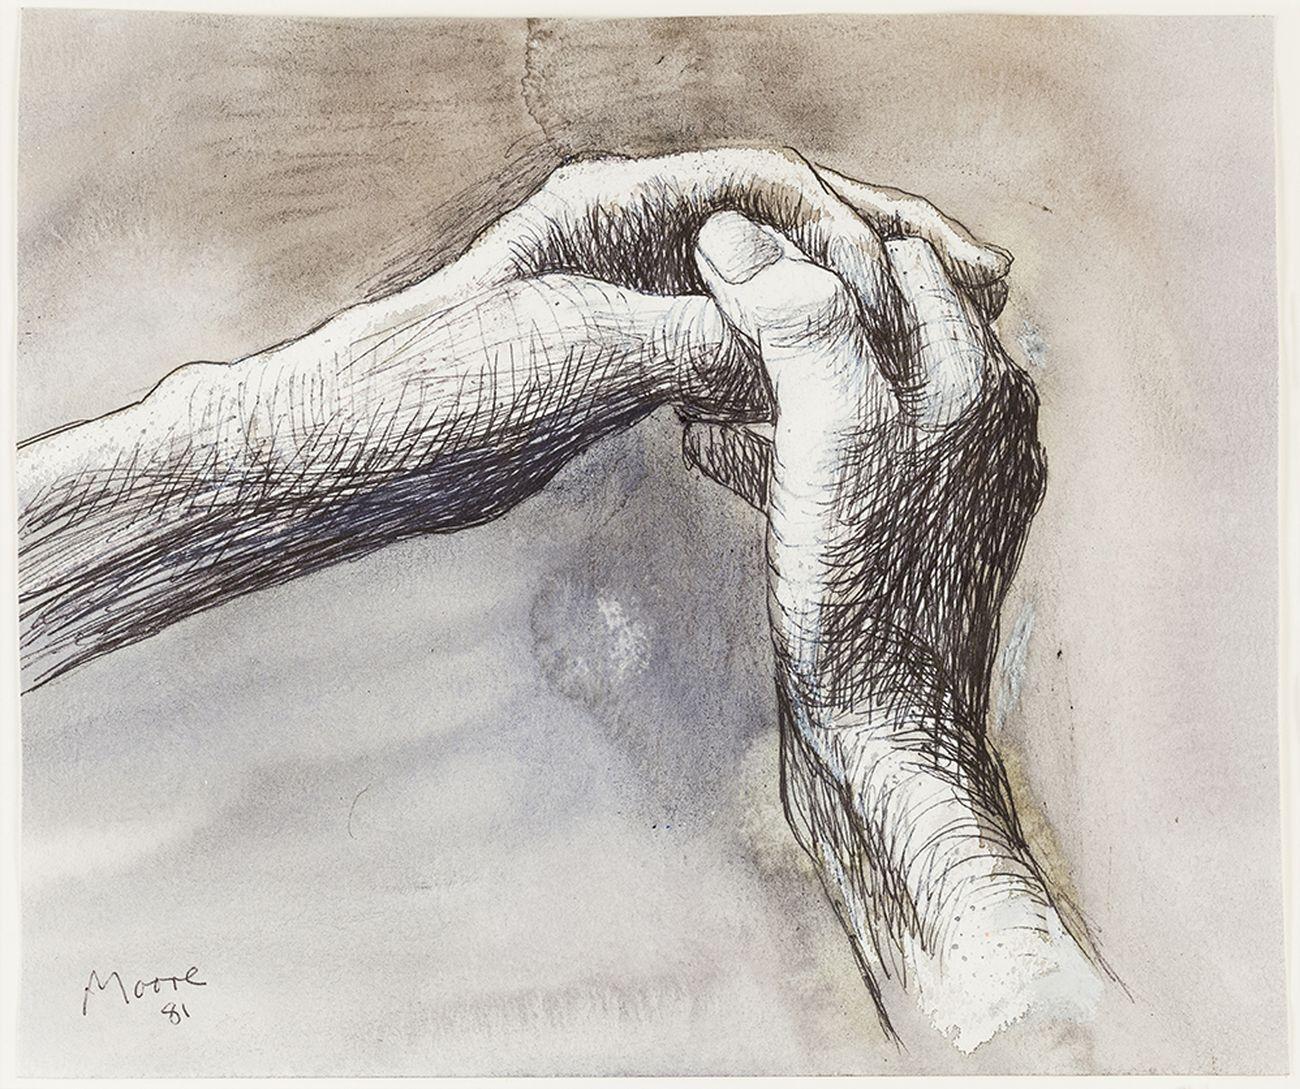 Henry Moore, The Artist's Hands, 1981. Photo Nigel Moore, Menor